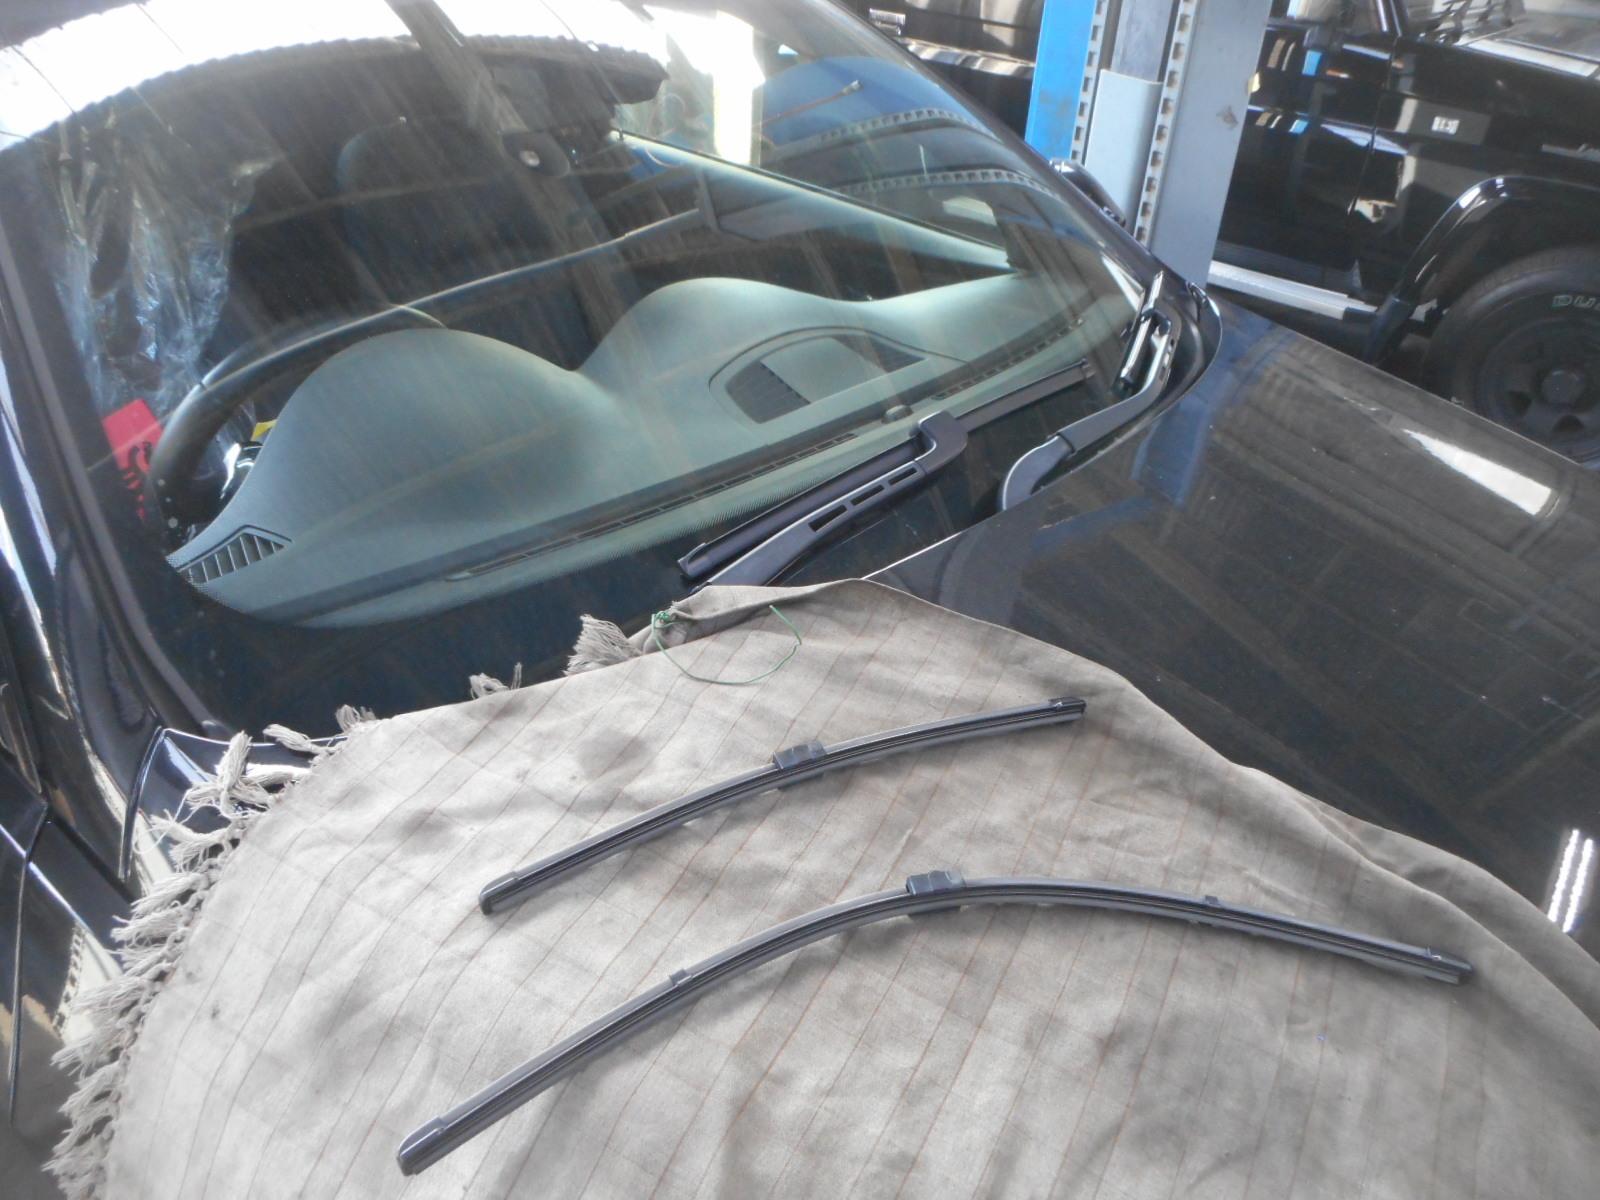 BMW335 クーペ (E90) エンジンオイル漏れ修理 納車整備_c0267693_17111646.jpg